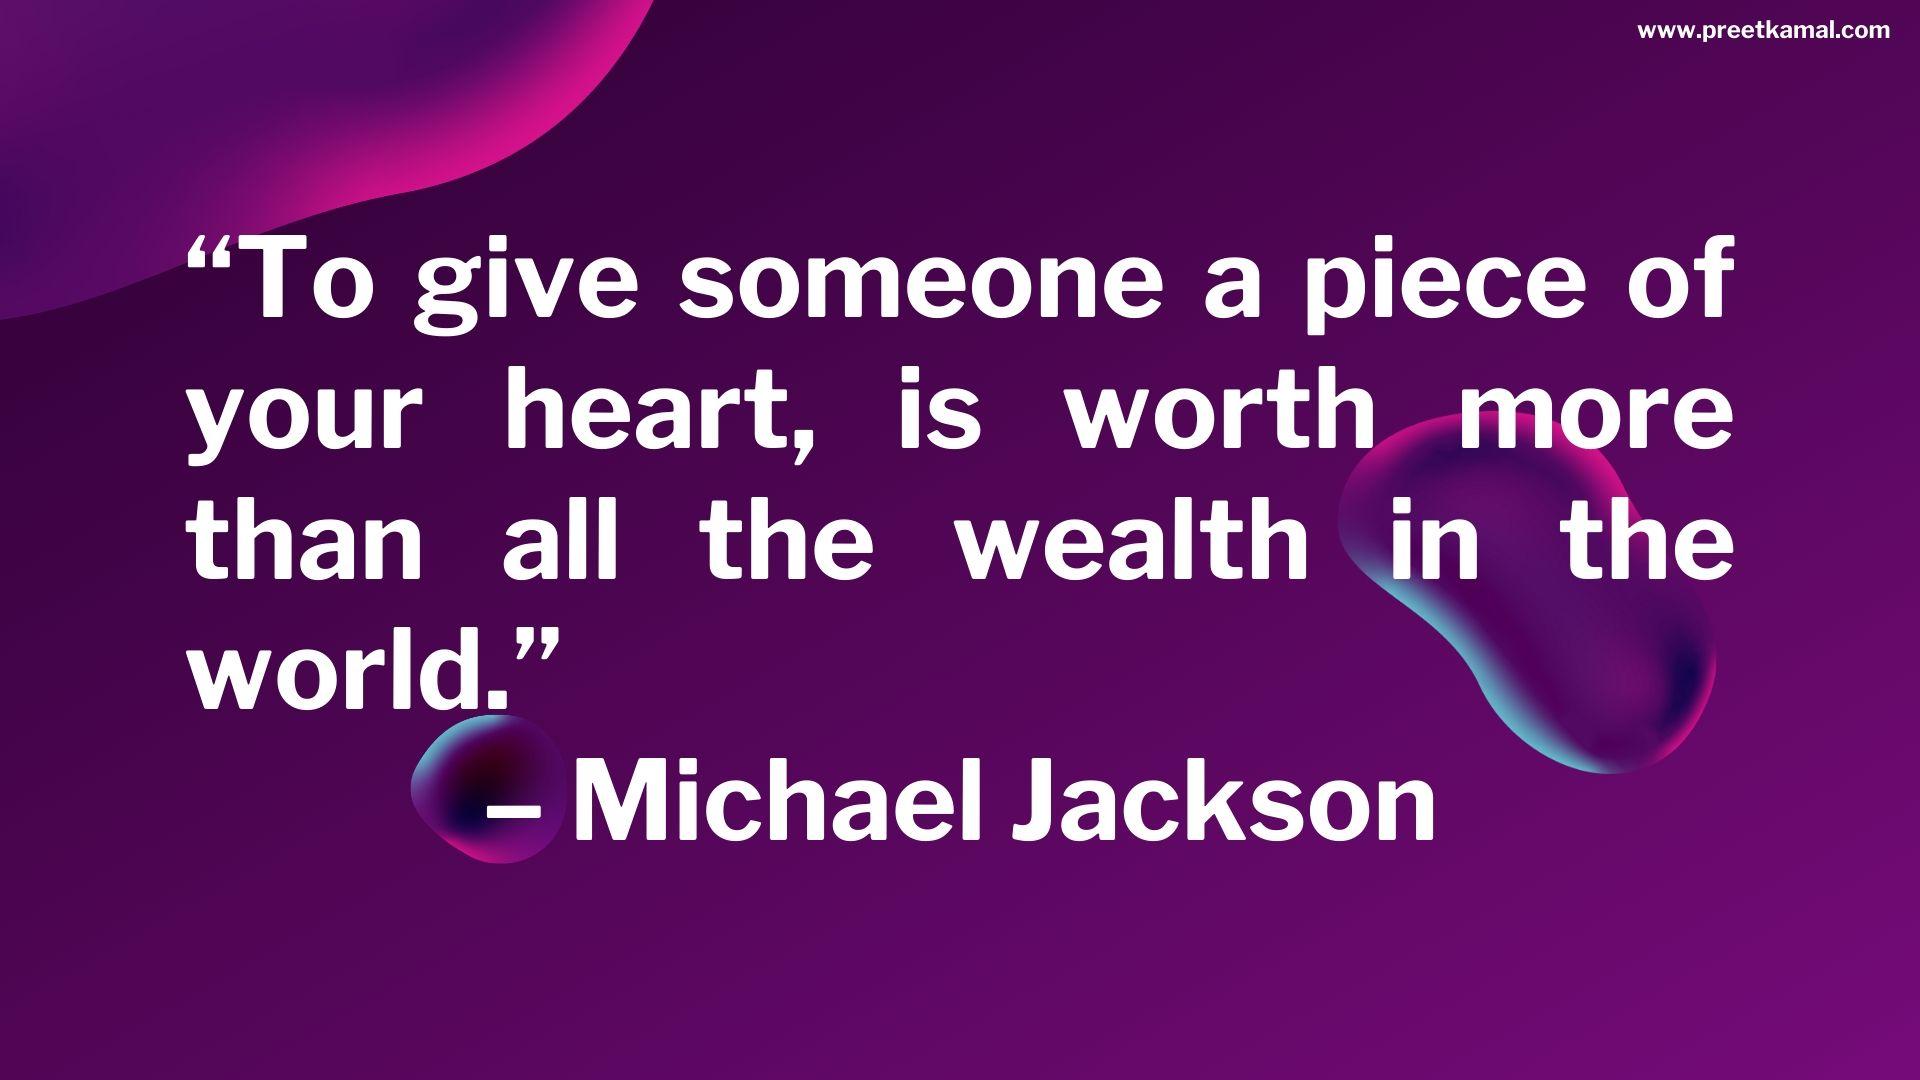 Michael Jackson Quotes (7)